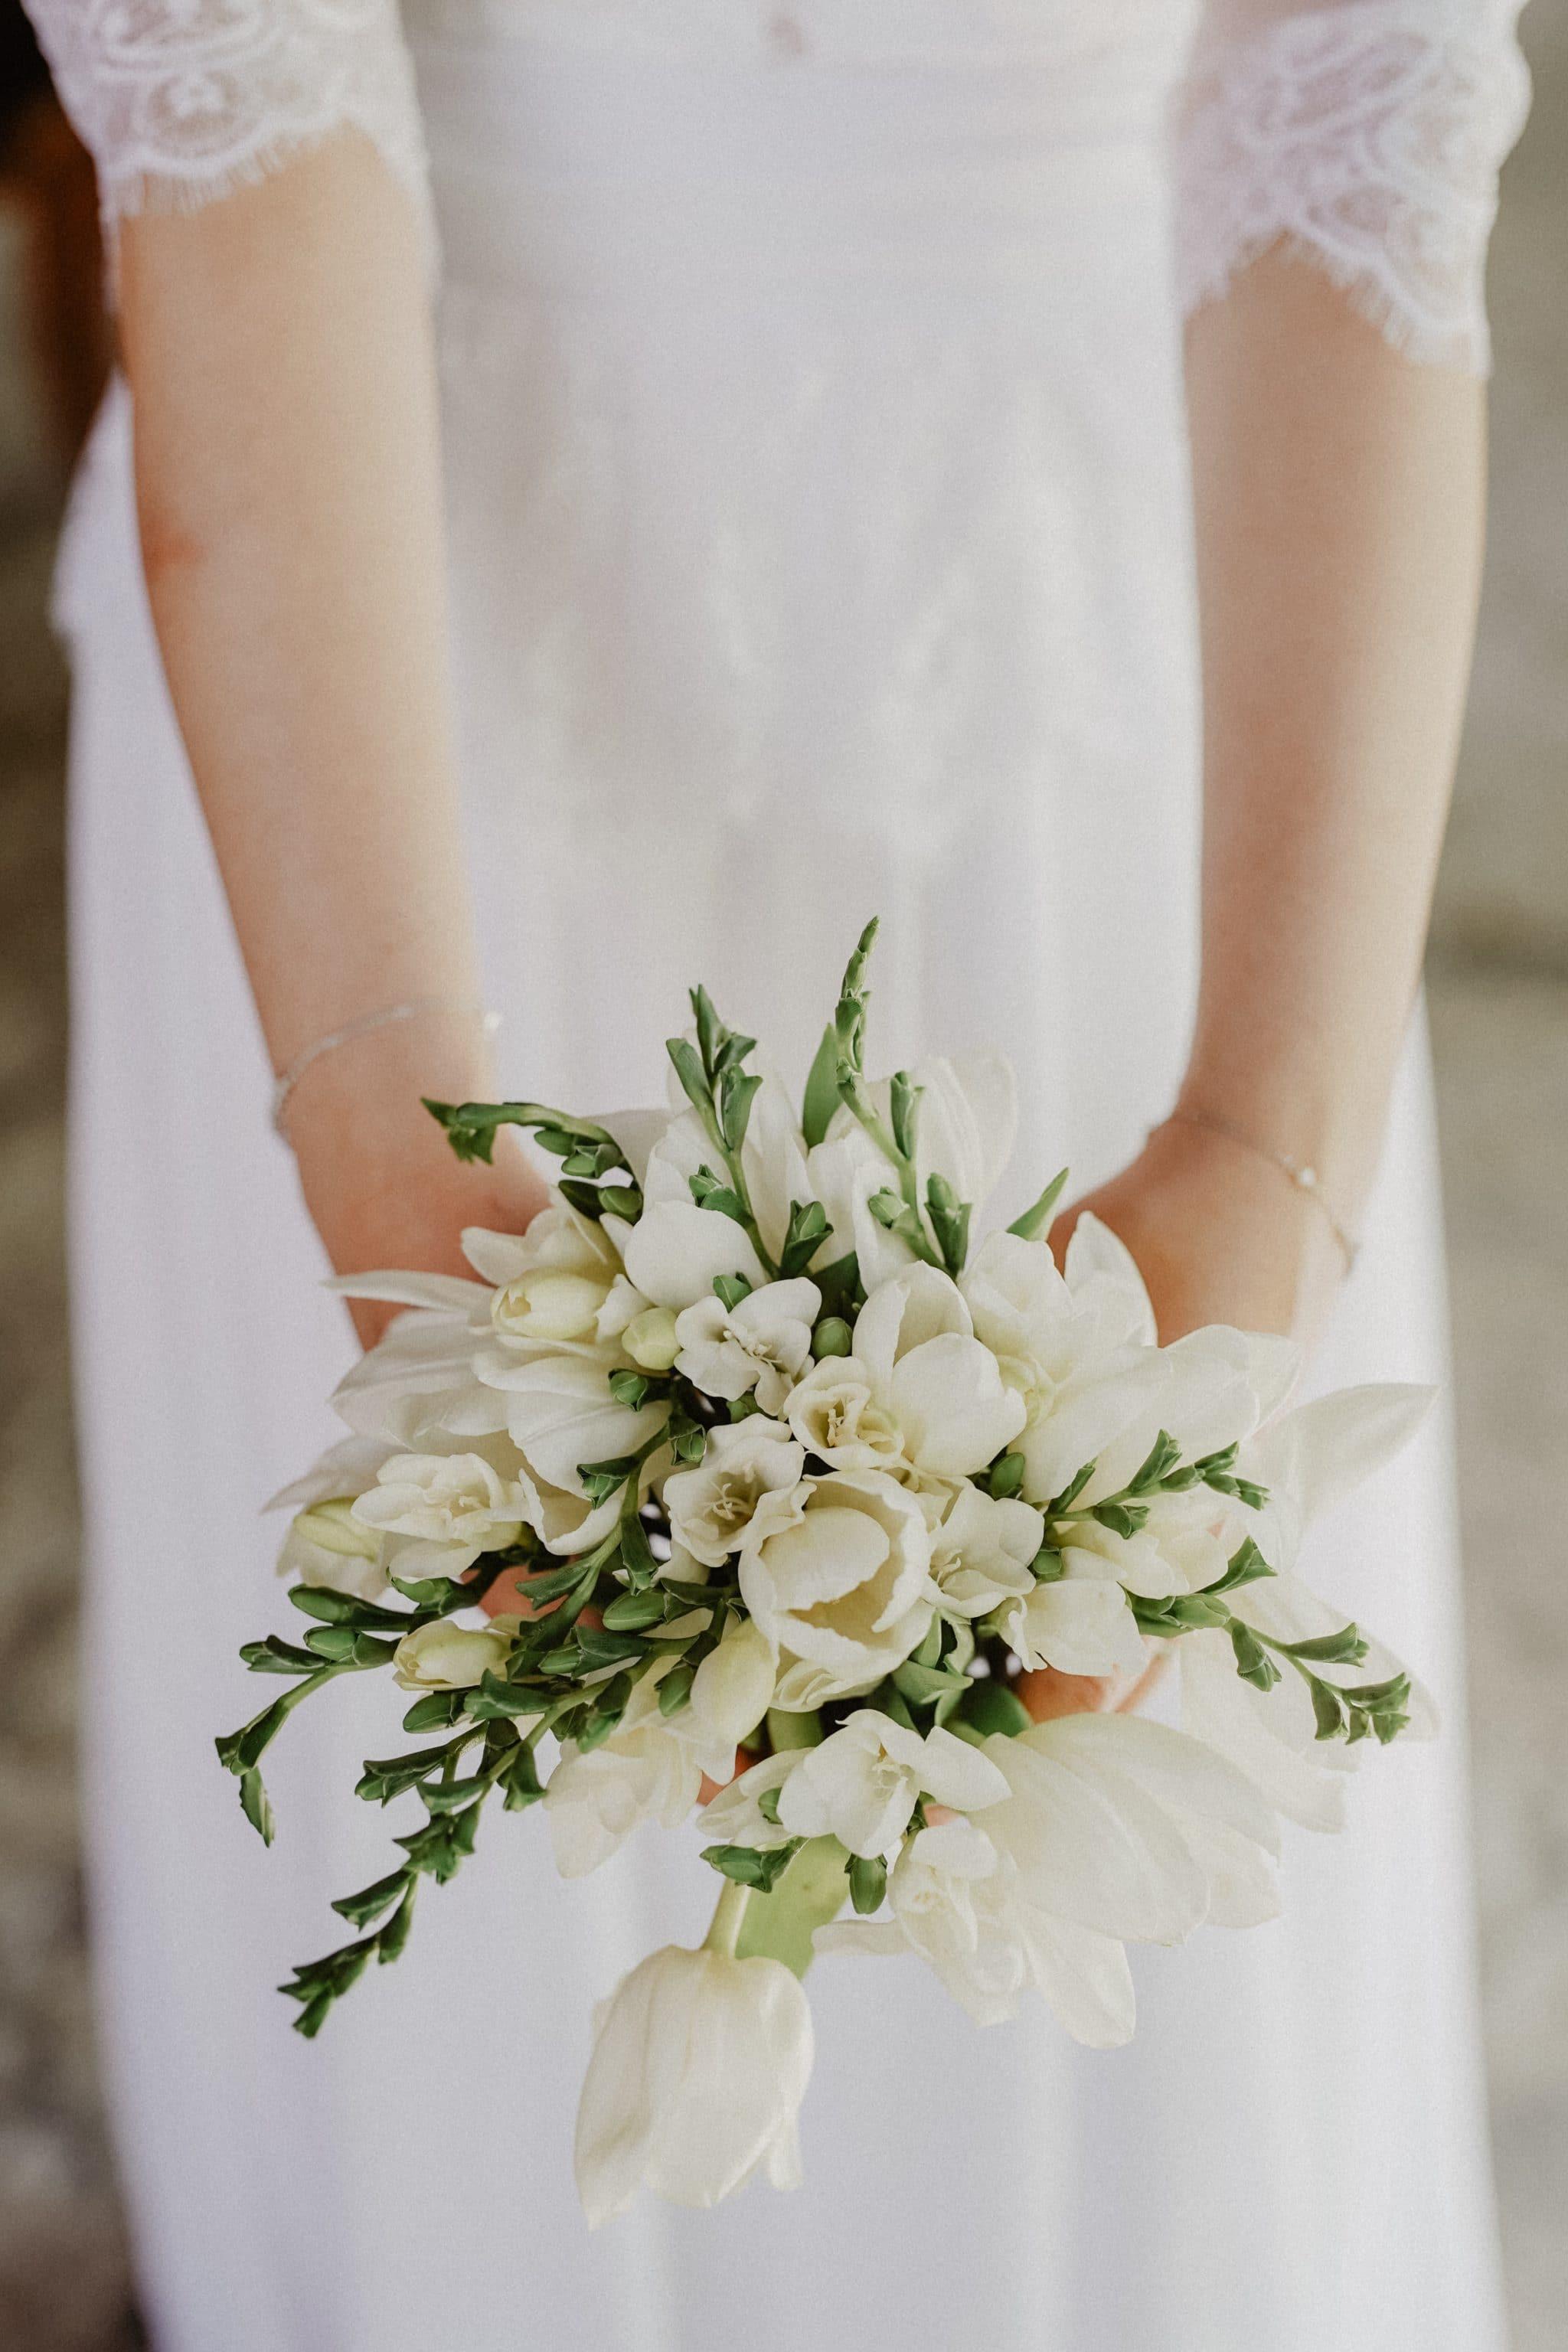 Petite νυφική ανθοδέσμη σε λευκό χρώμα